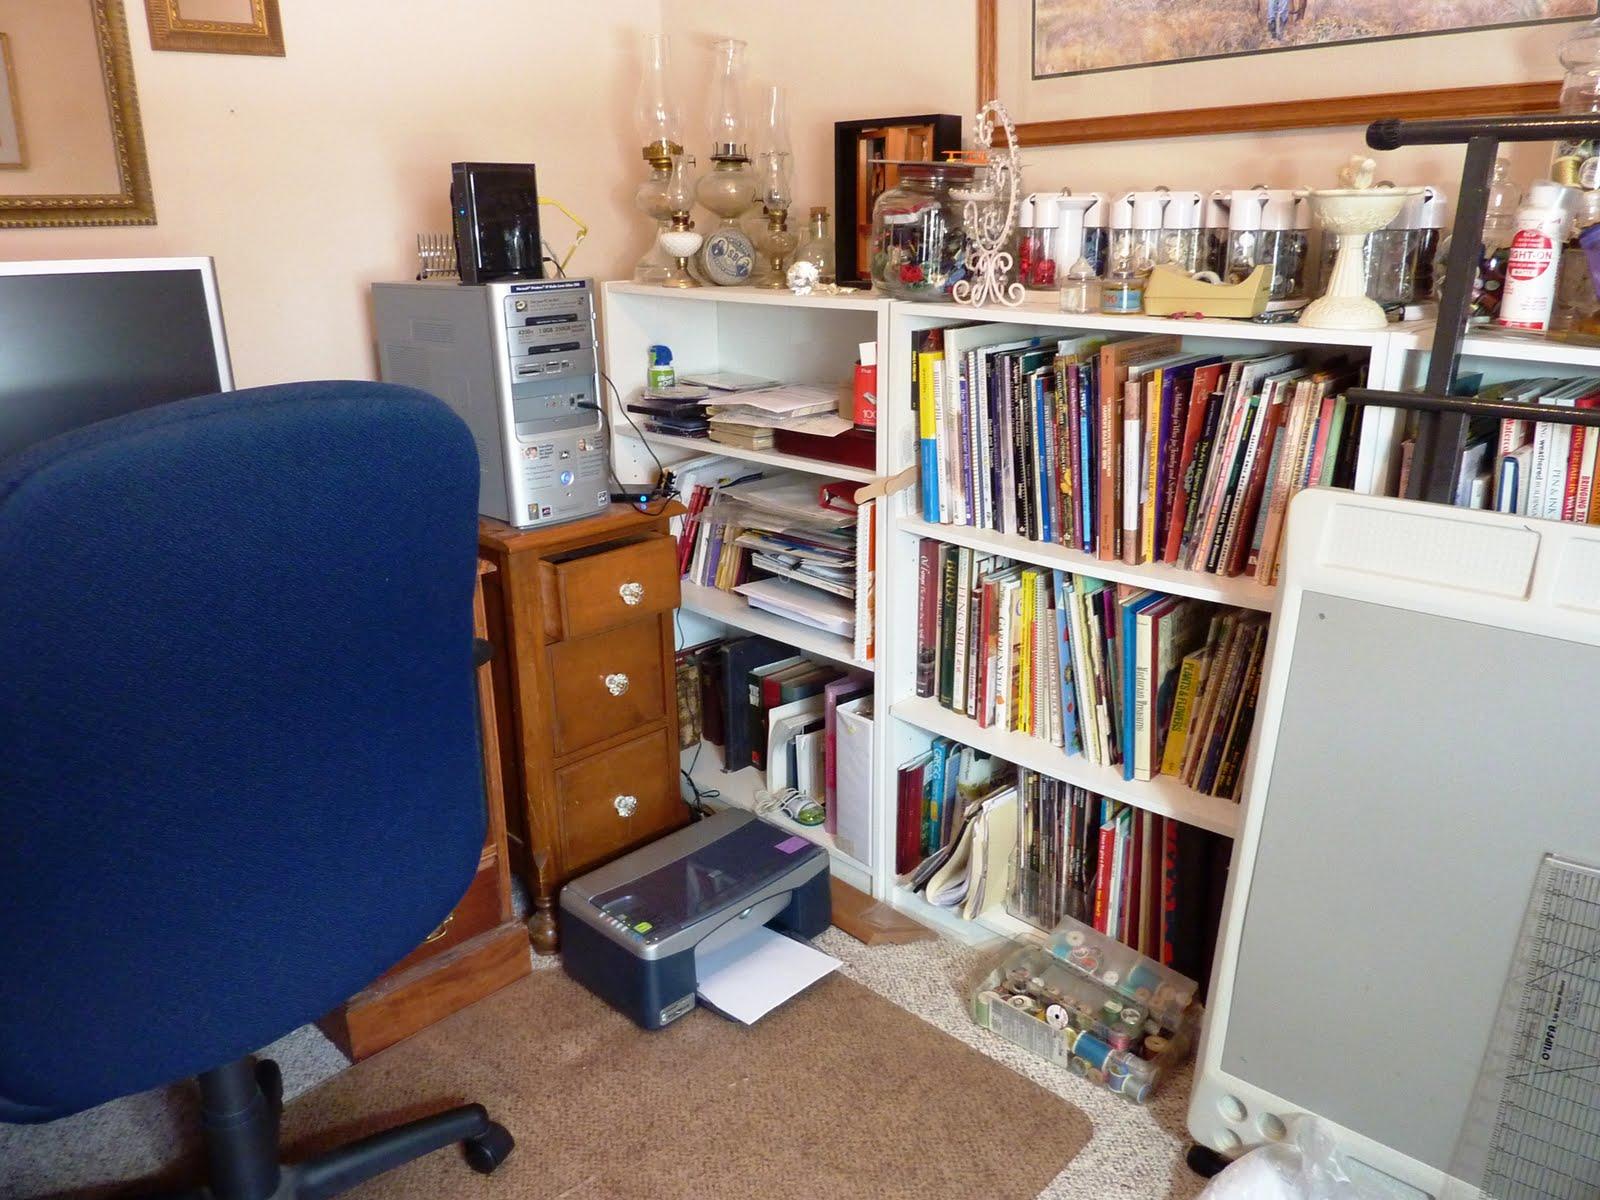 Ceoriginal Art And Craft Studio Organizing And Storage